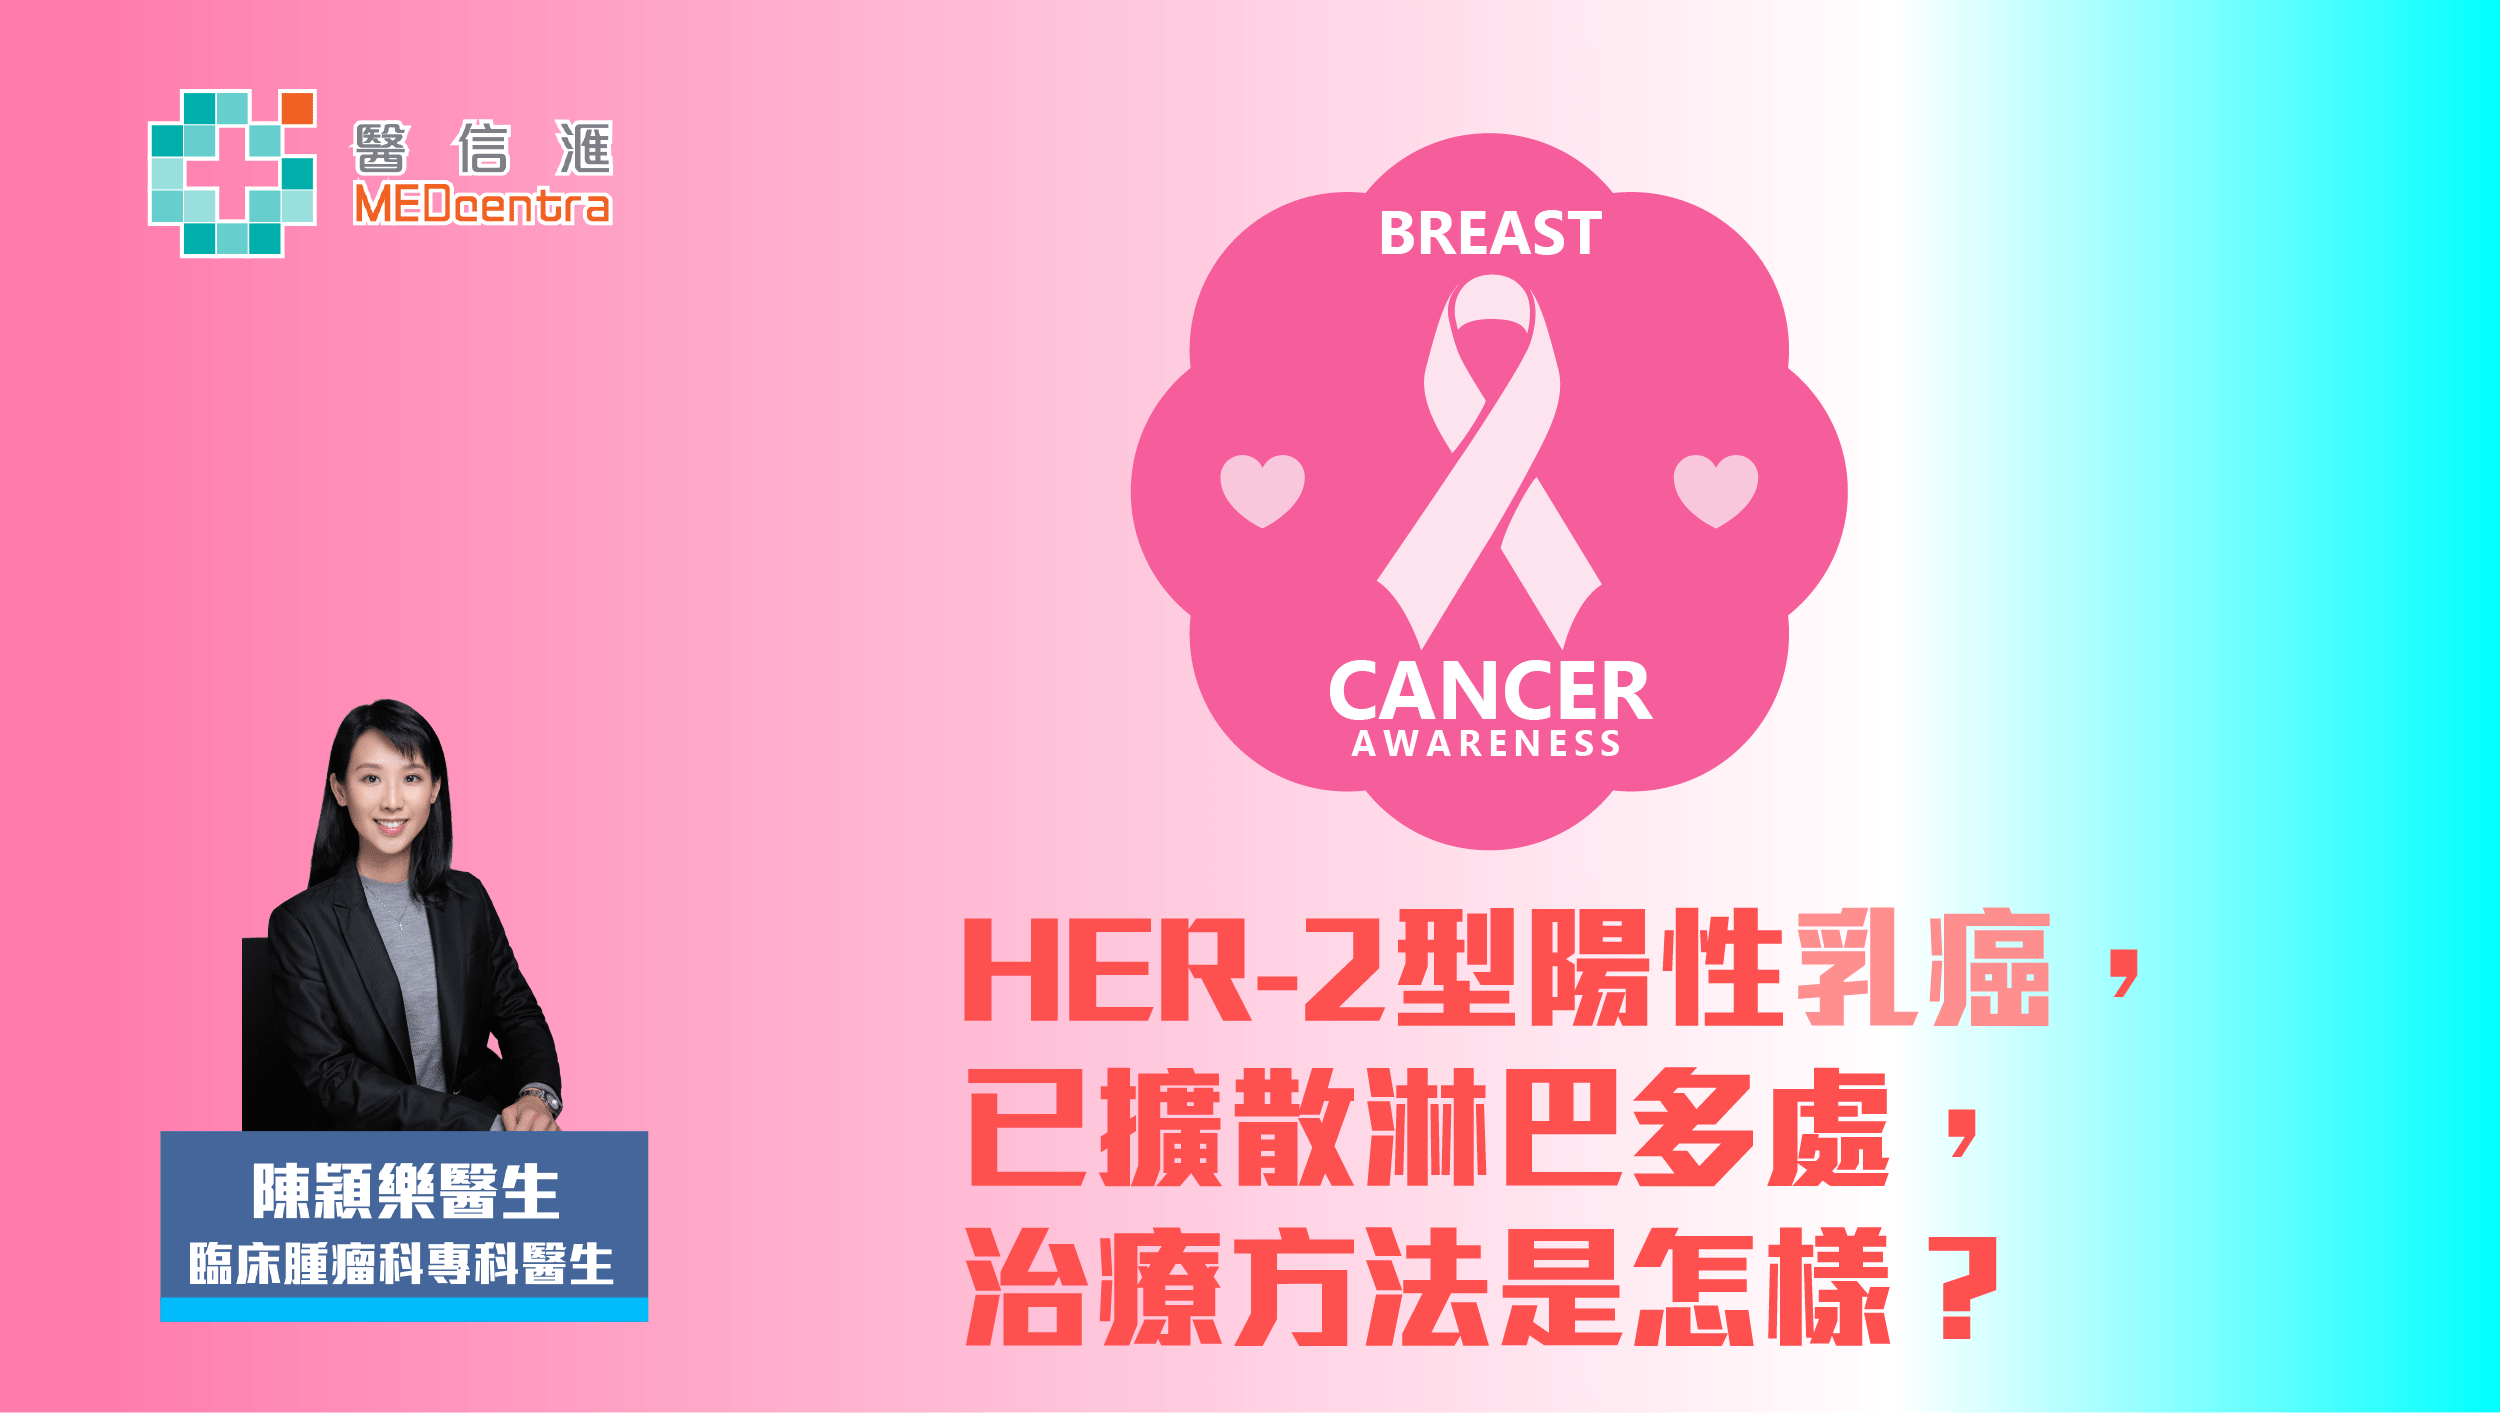 HER-2陽性乳癌已擴散淋巴多處的治療方法